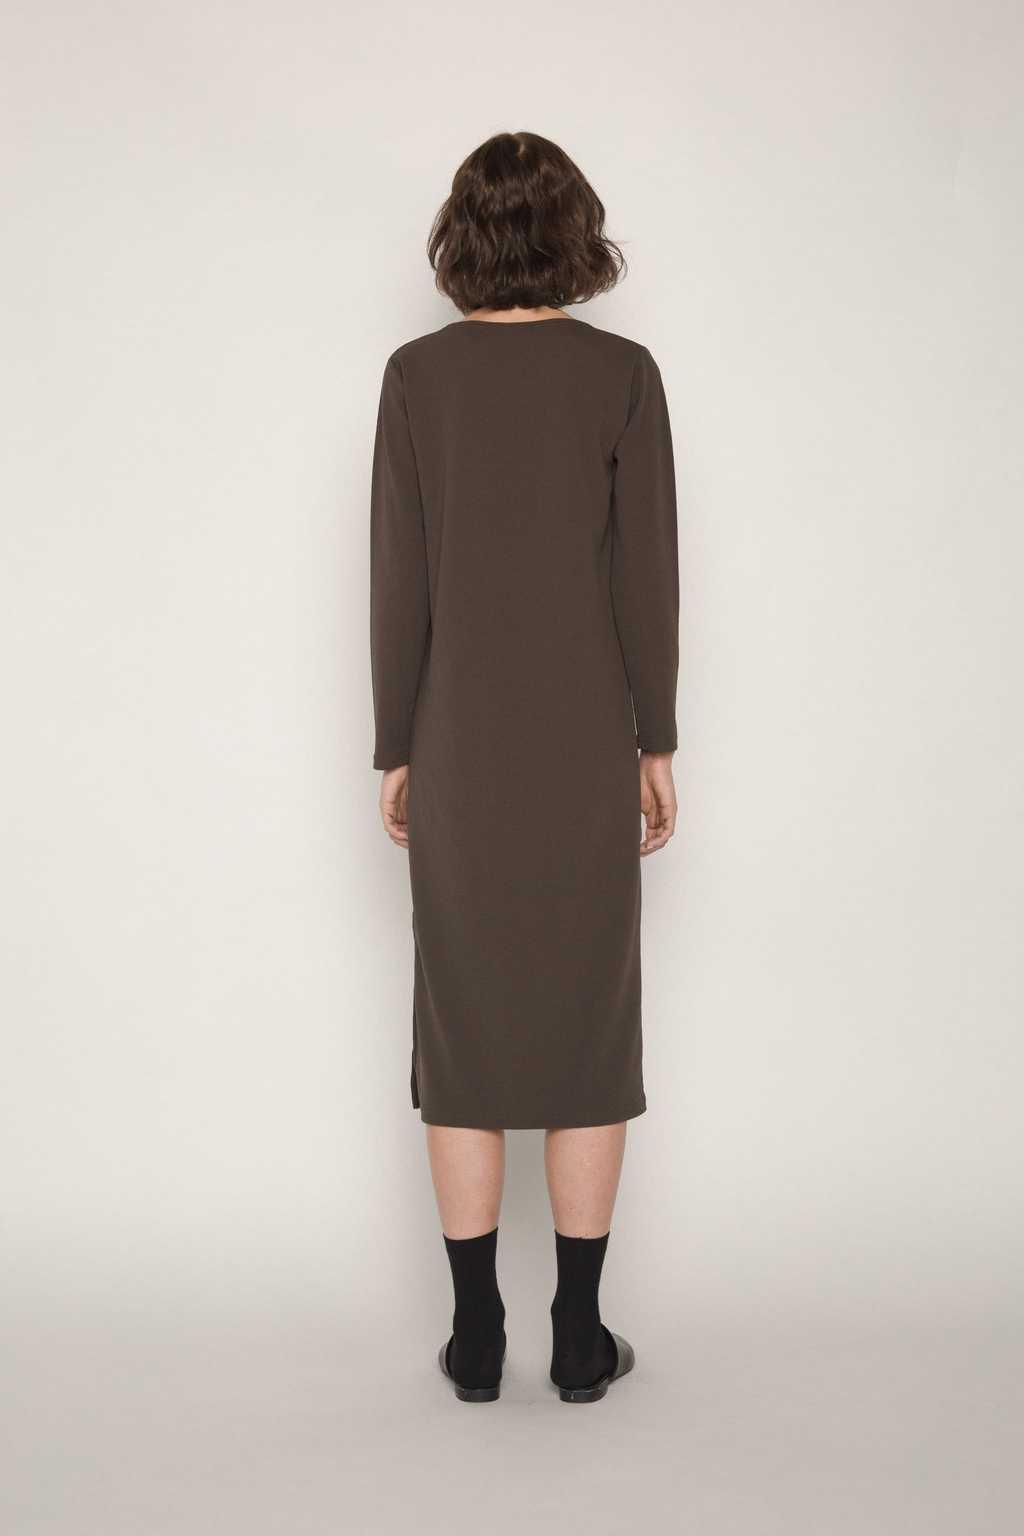 Dress H256 Olive 4